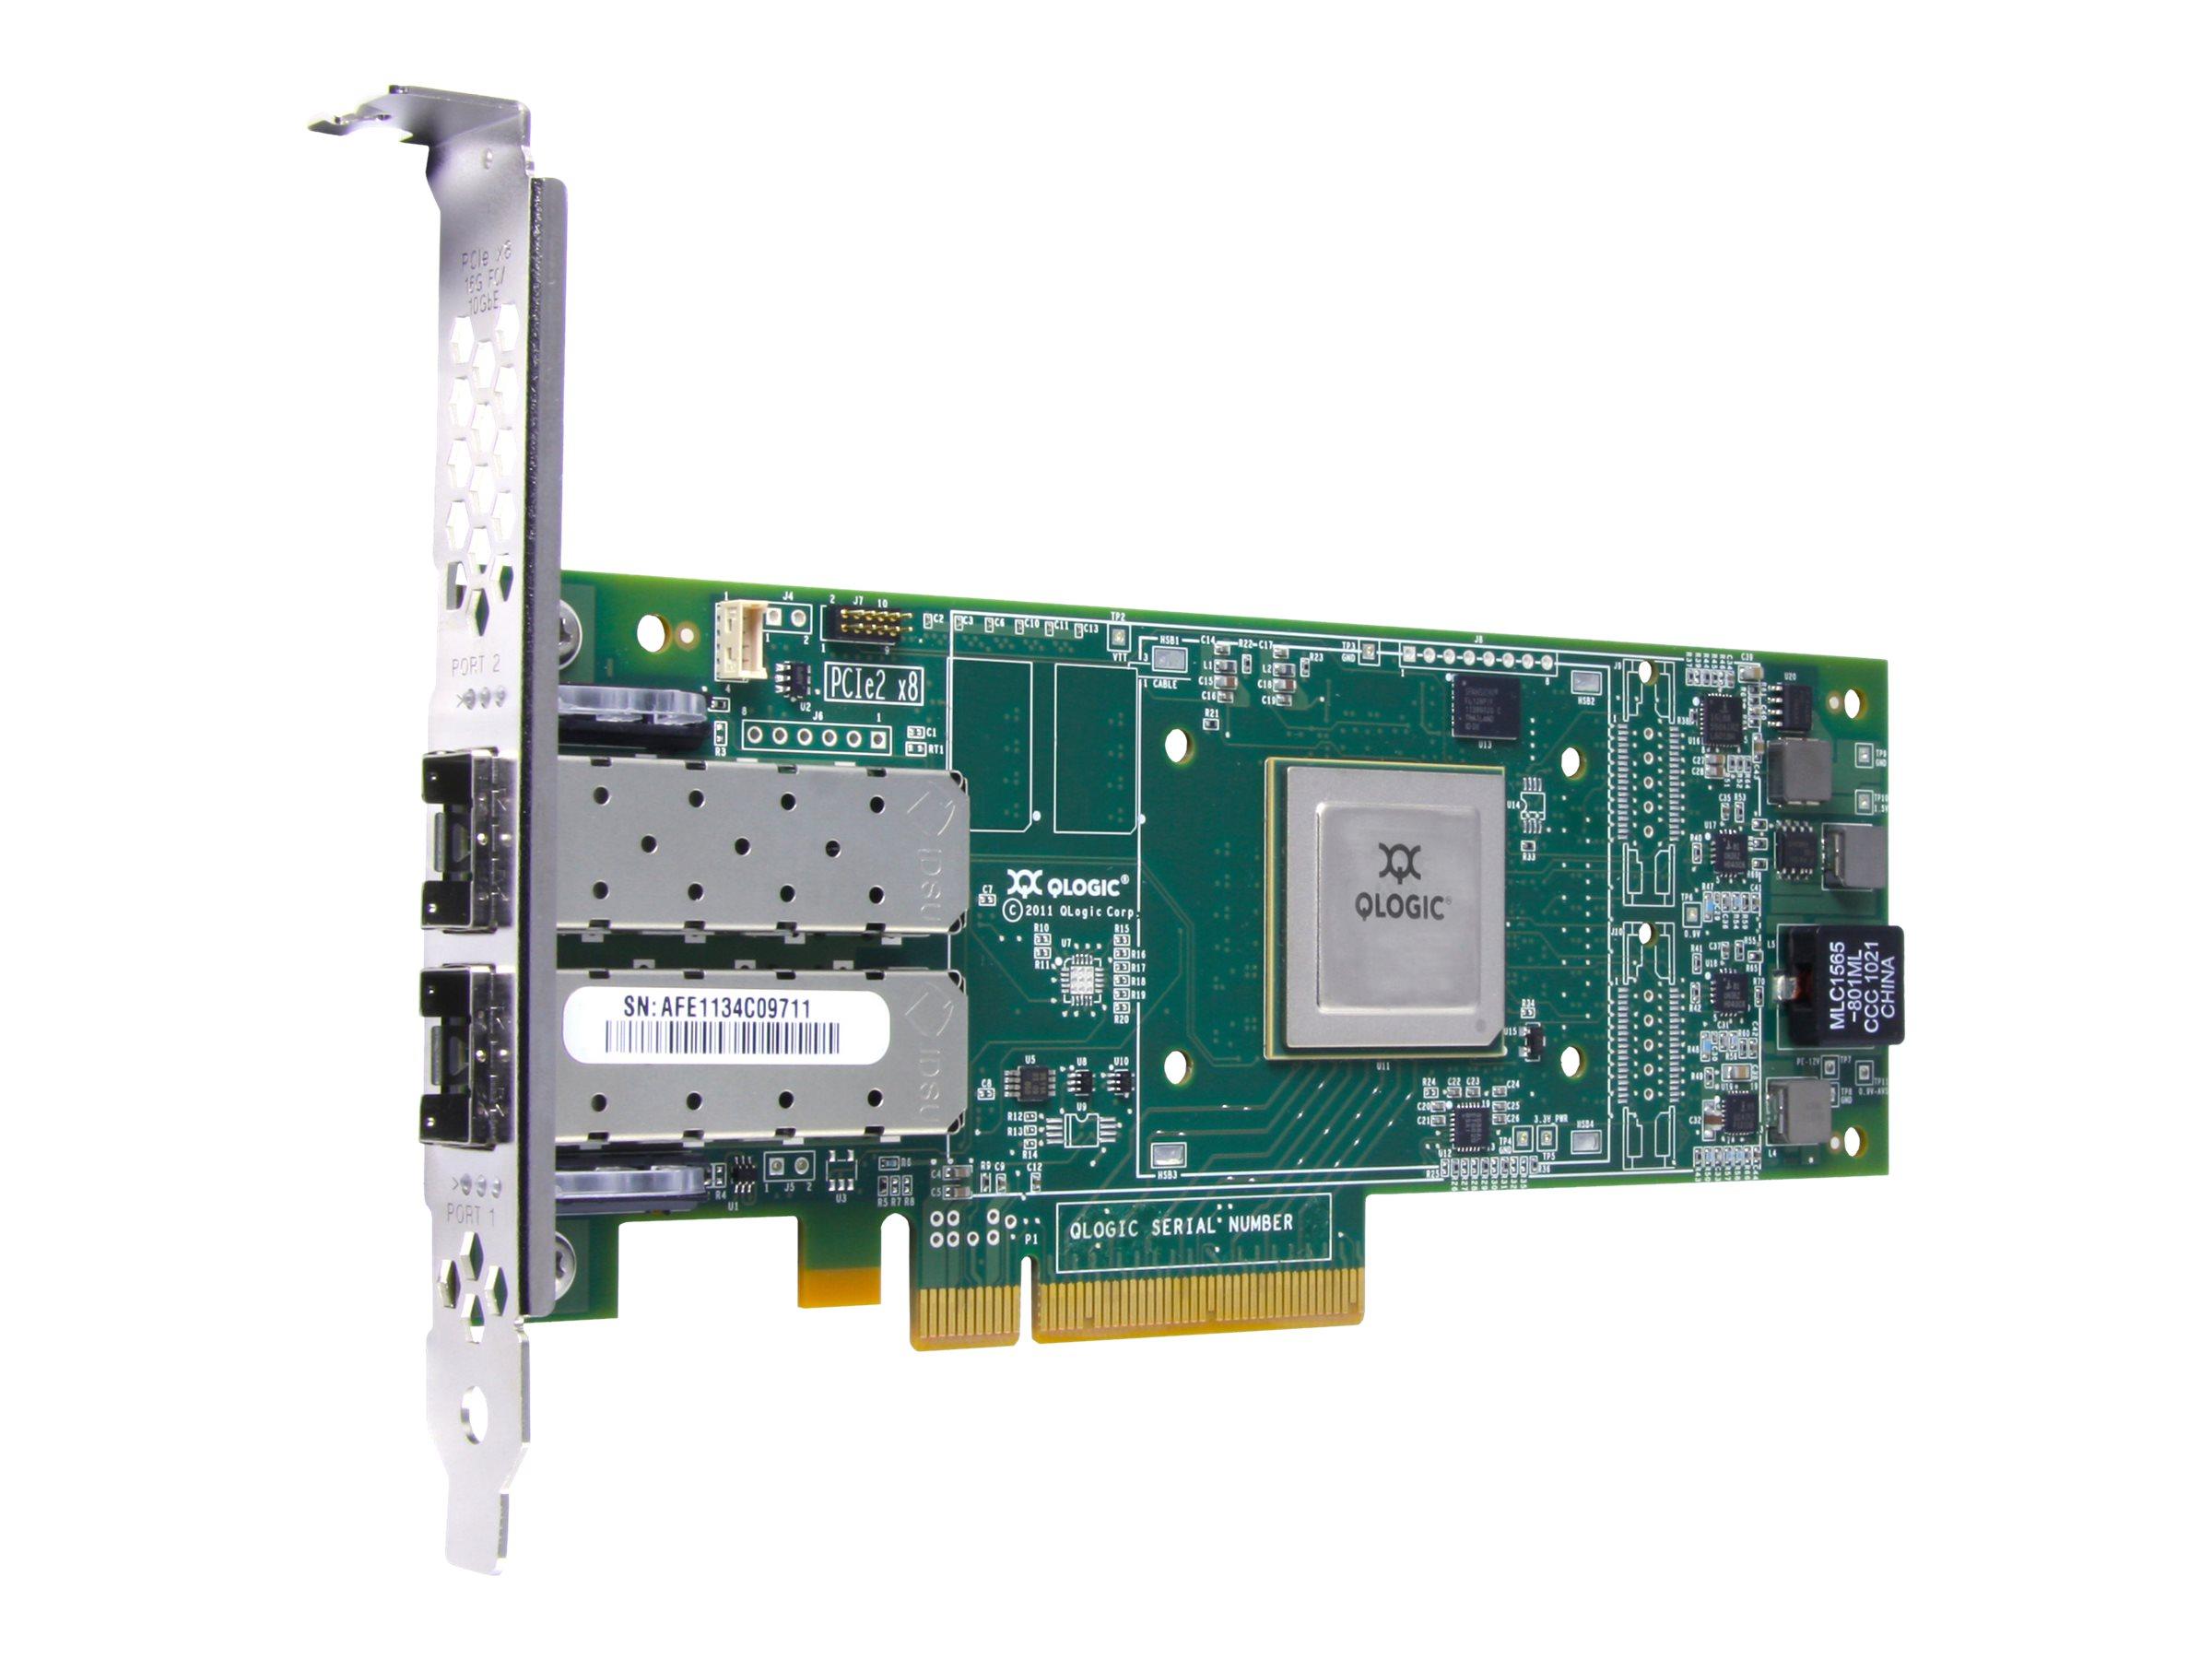 HPE SN1000Q - Hostbus-Adapter - PCIe 2.0 x8 Low-Profile - 16Gb Fibre Channel x 2 - für Integrity rx2800 i4 Office Friendly Base